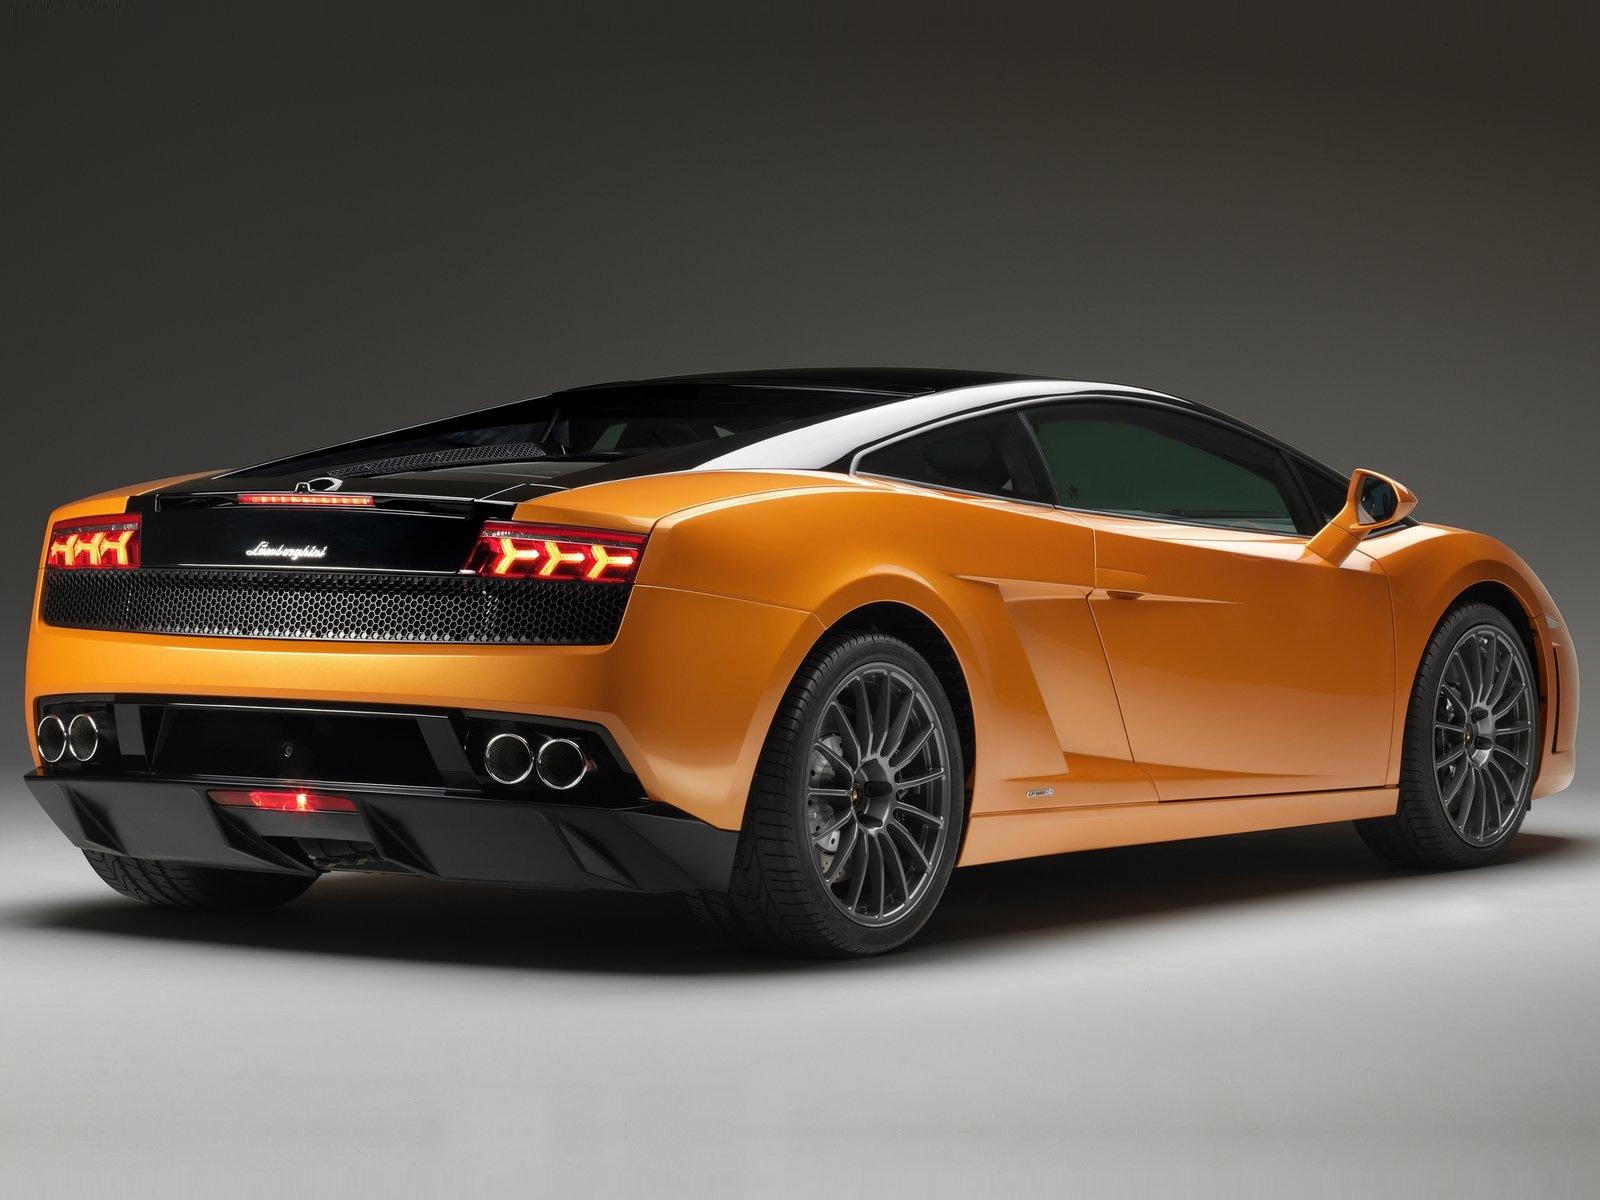 Nancys Car Designs: 2011 Lamborghini Gallardo LP560-4 Bicolore